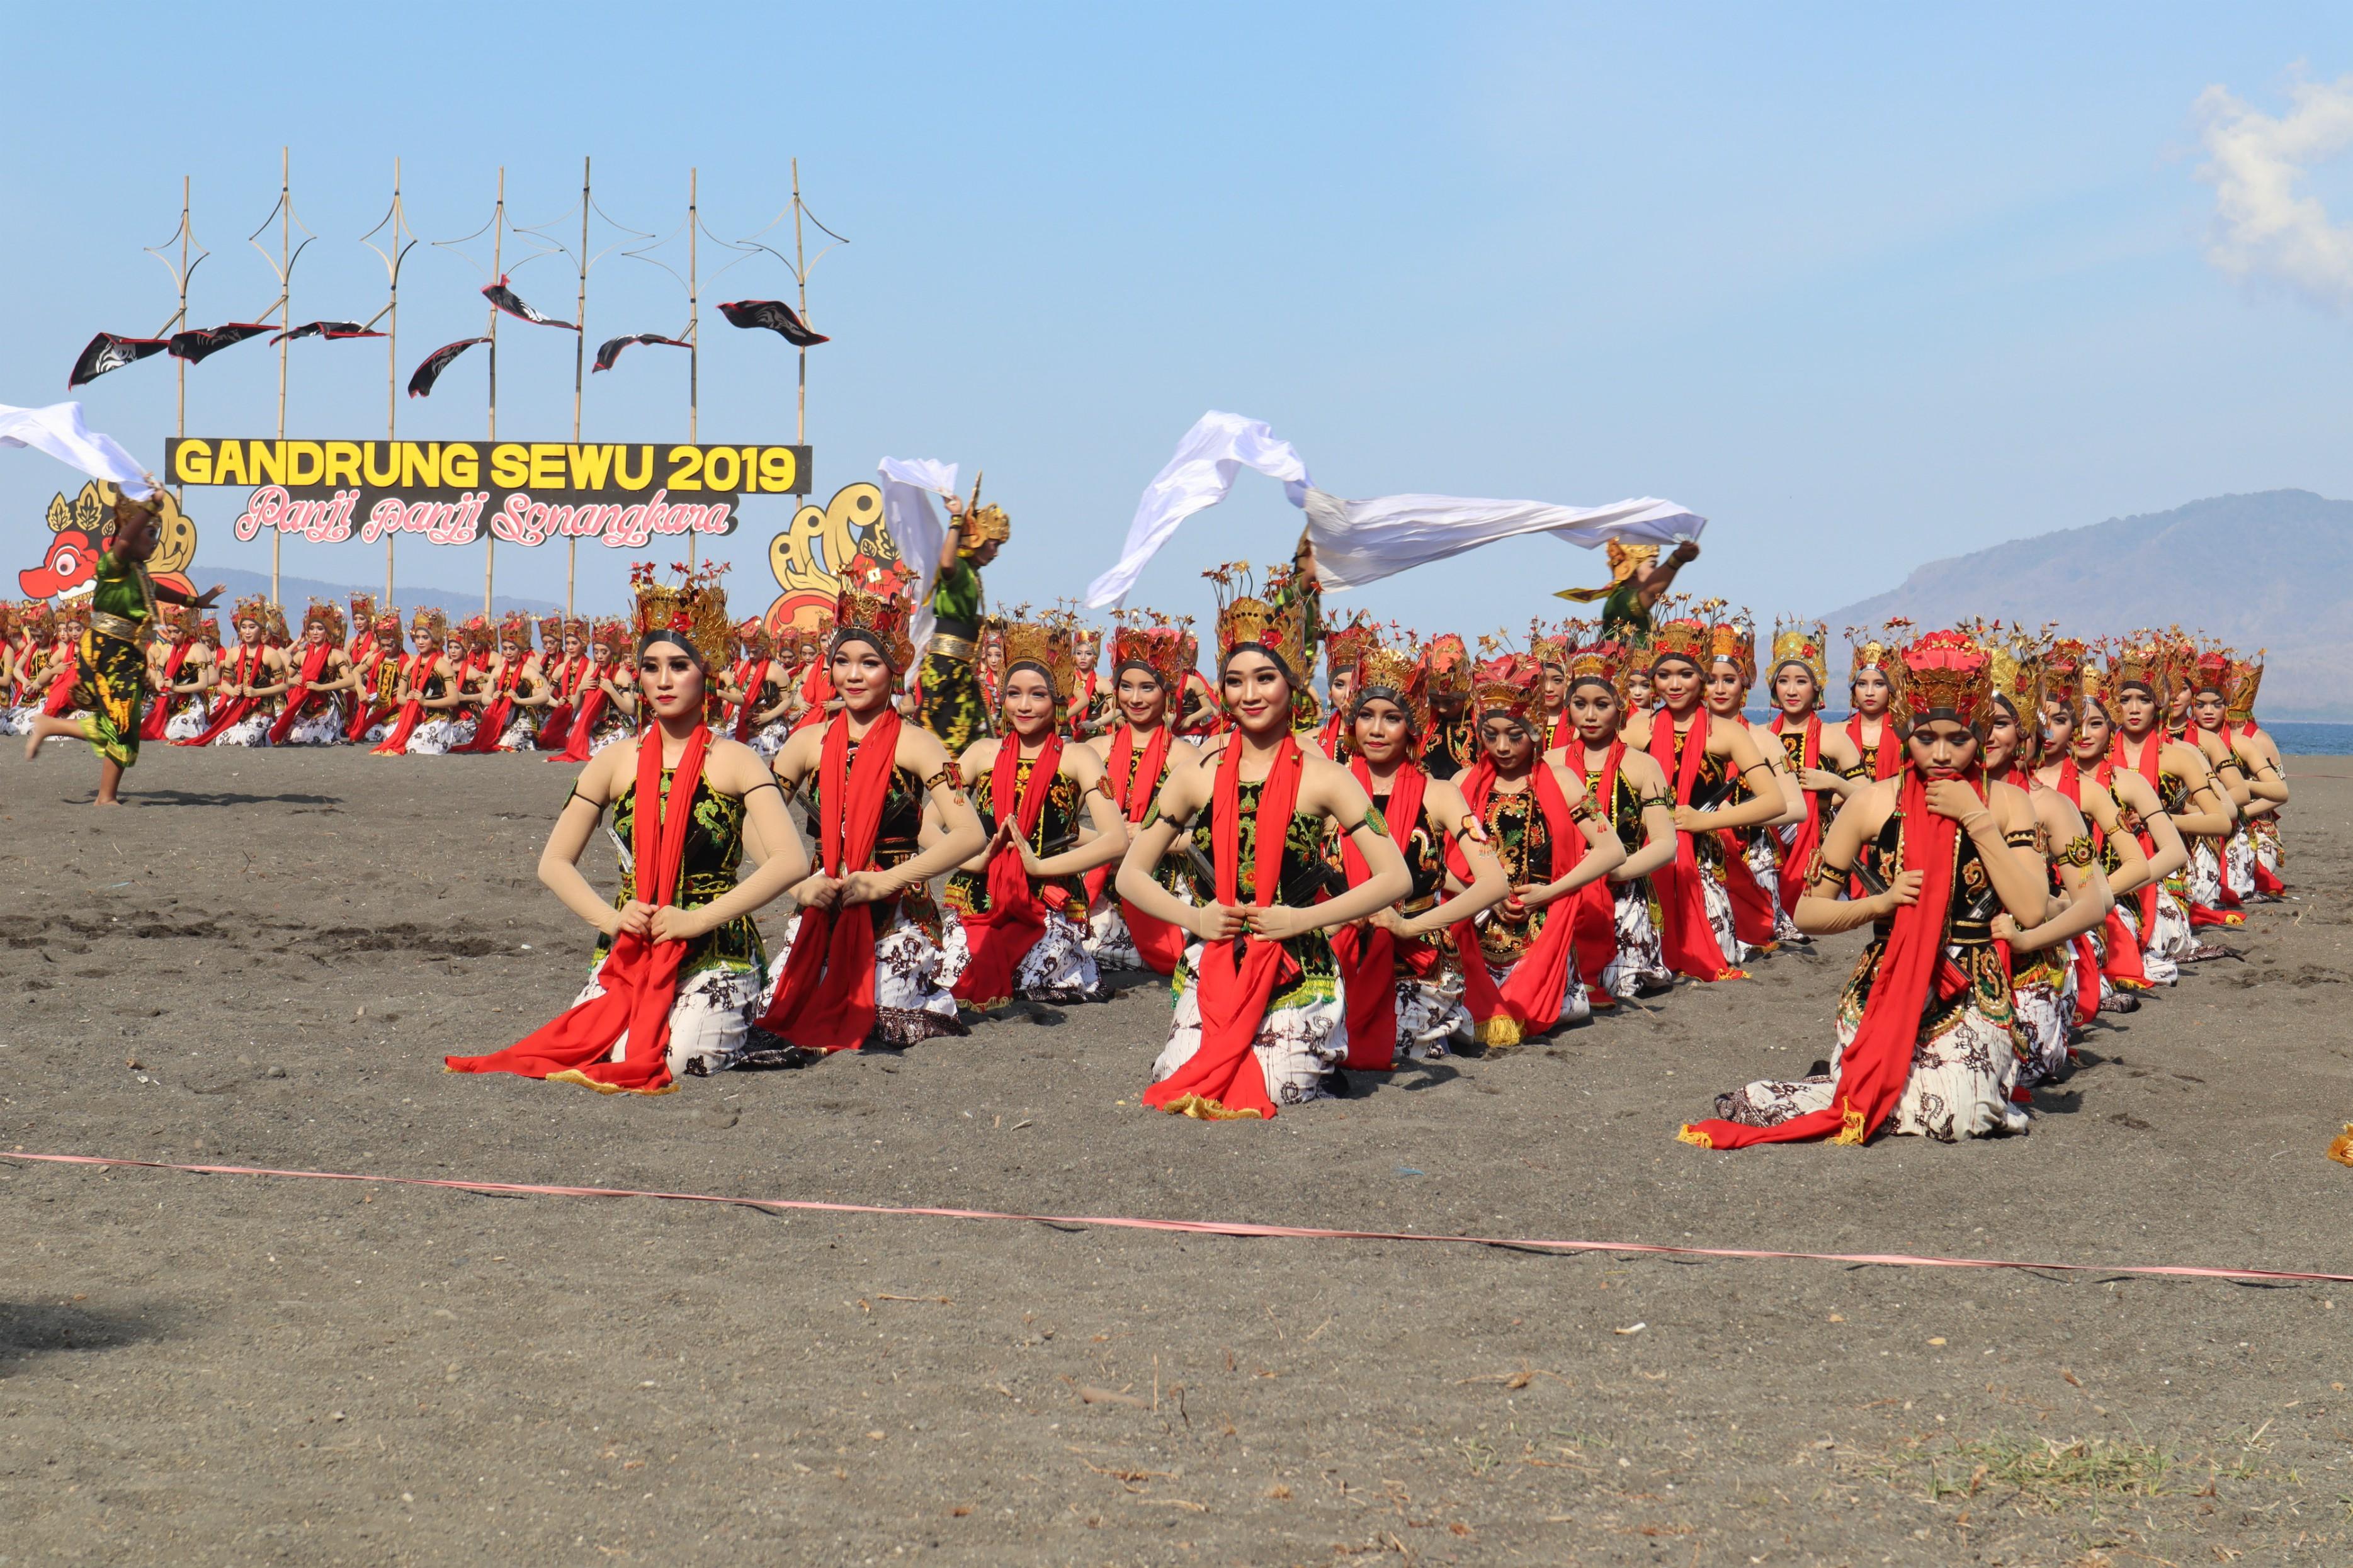 Festival Gandrung Sewu sudah diadakan sejak 2012 | Foto: Martha Tilaar